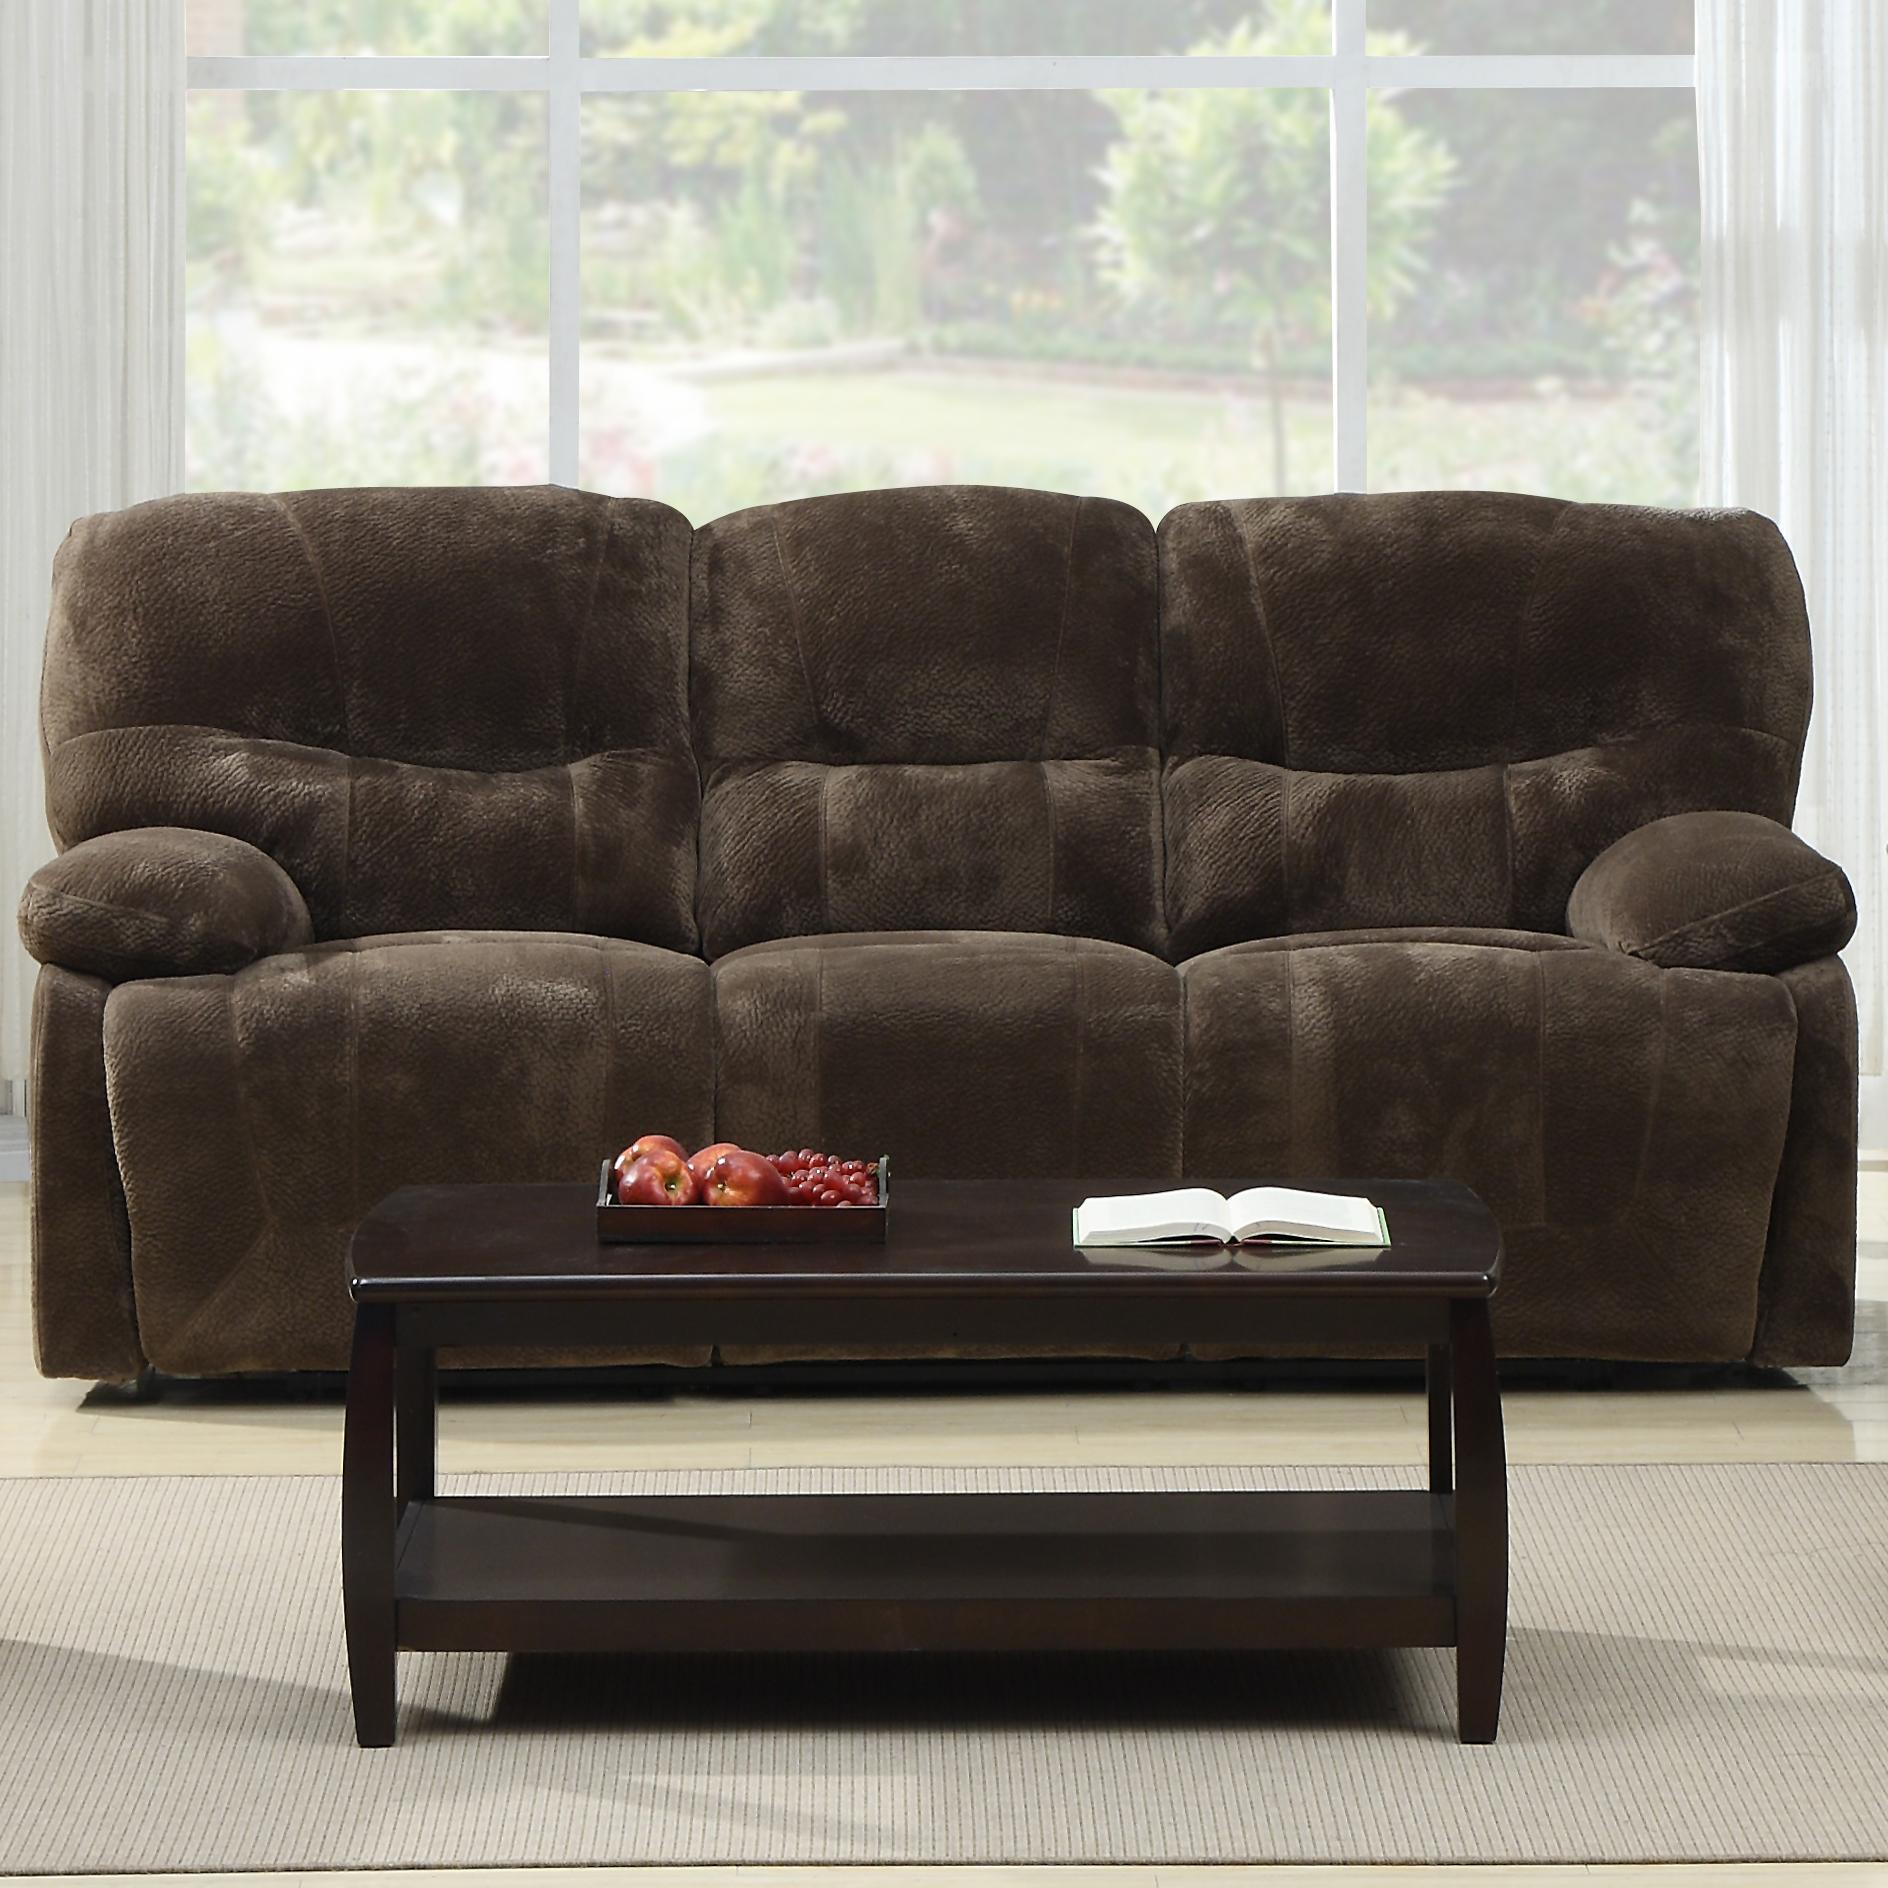 Emerald HarrisonRecliner Sofa; Emerald HarrisonRecliner Sofa